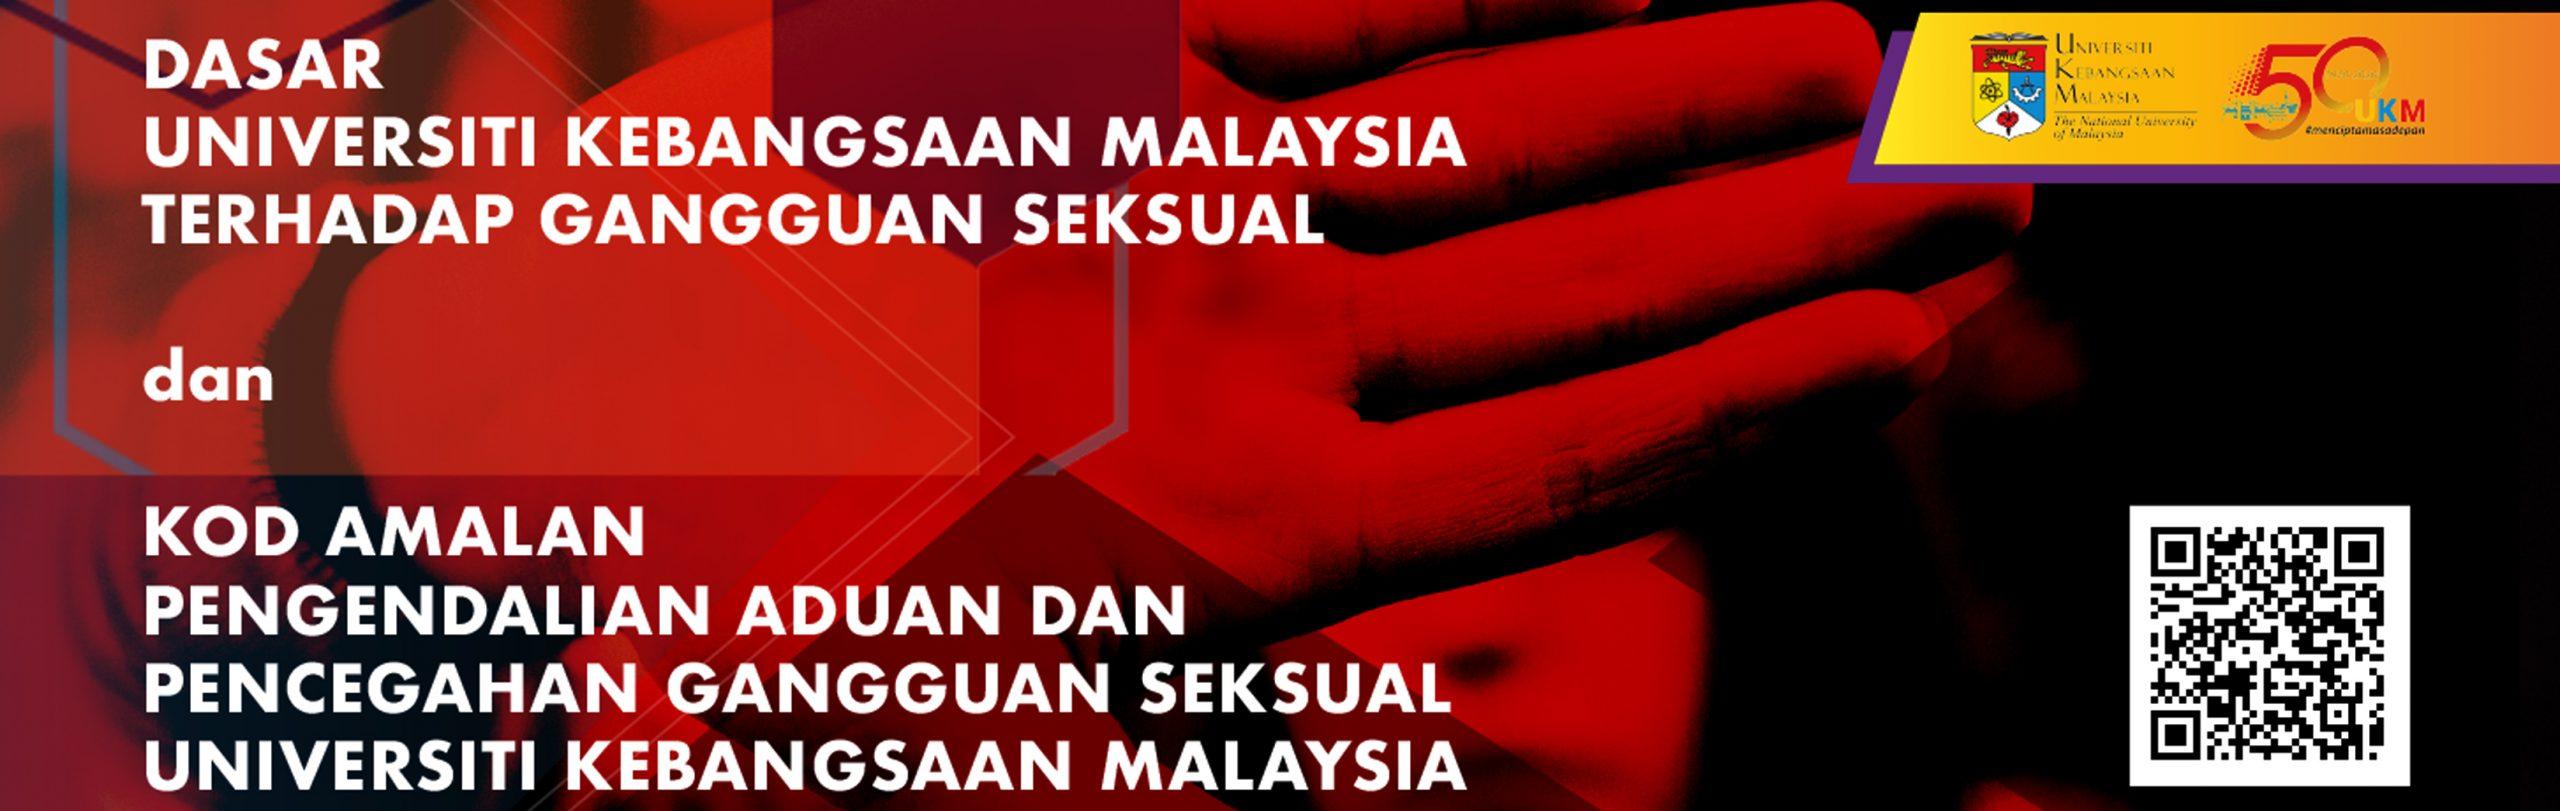 Dasar dan Kod Amalan Gangguan Seksual